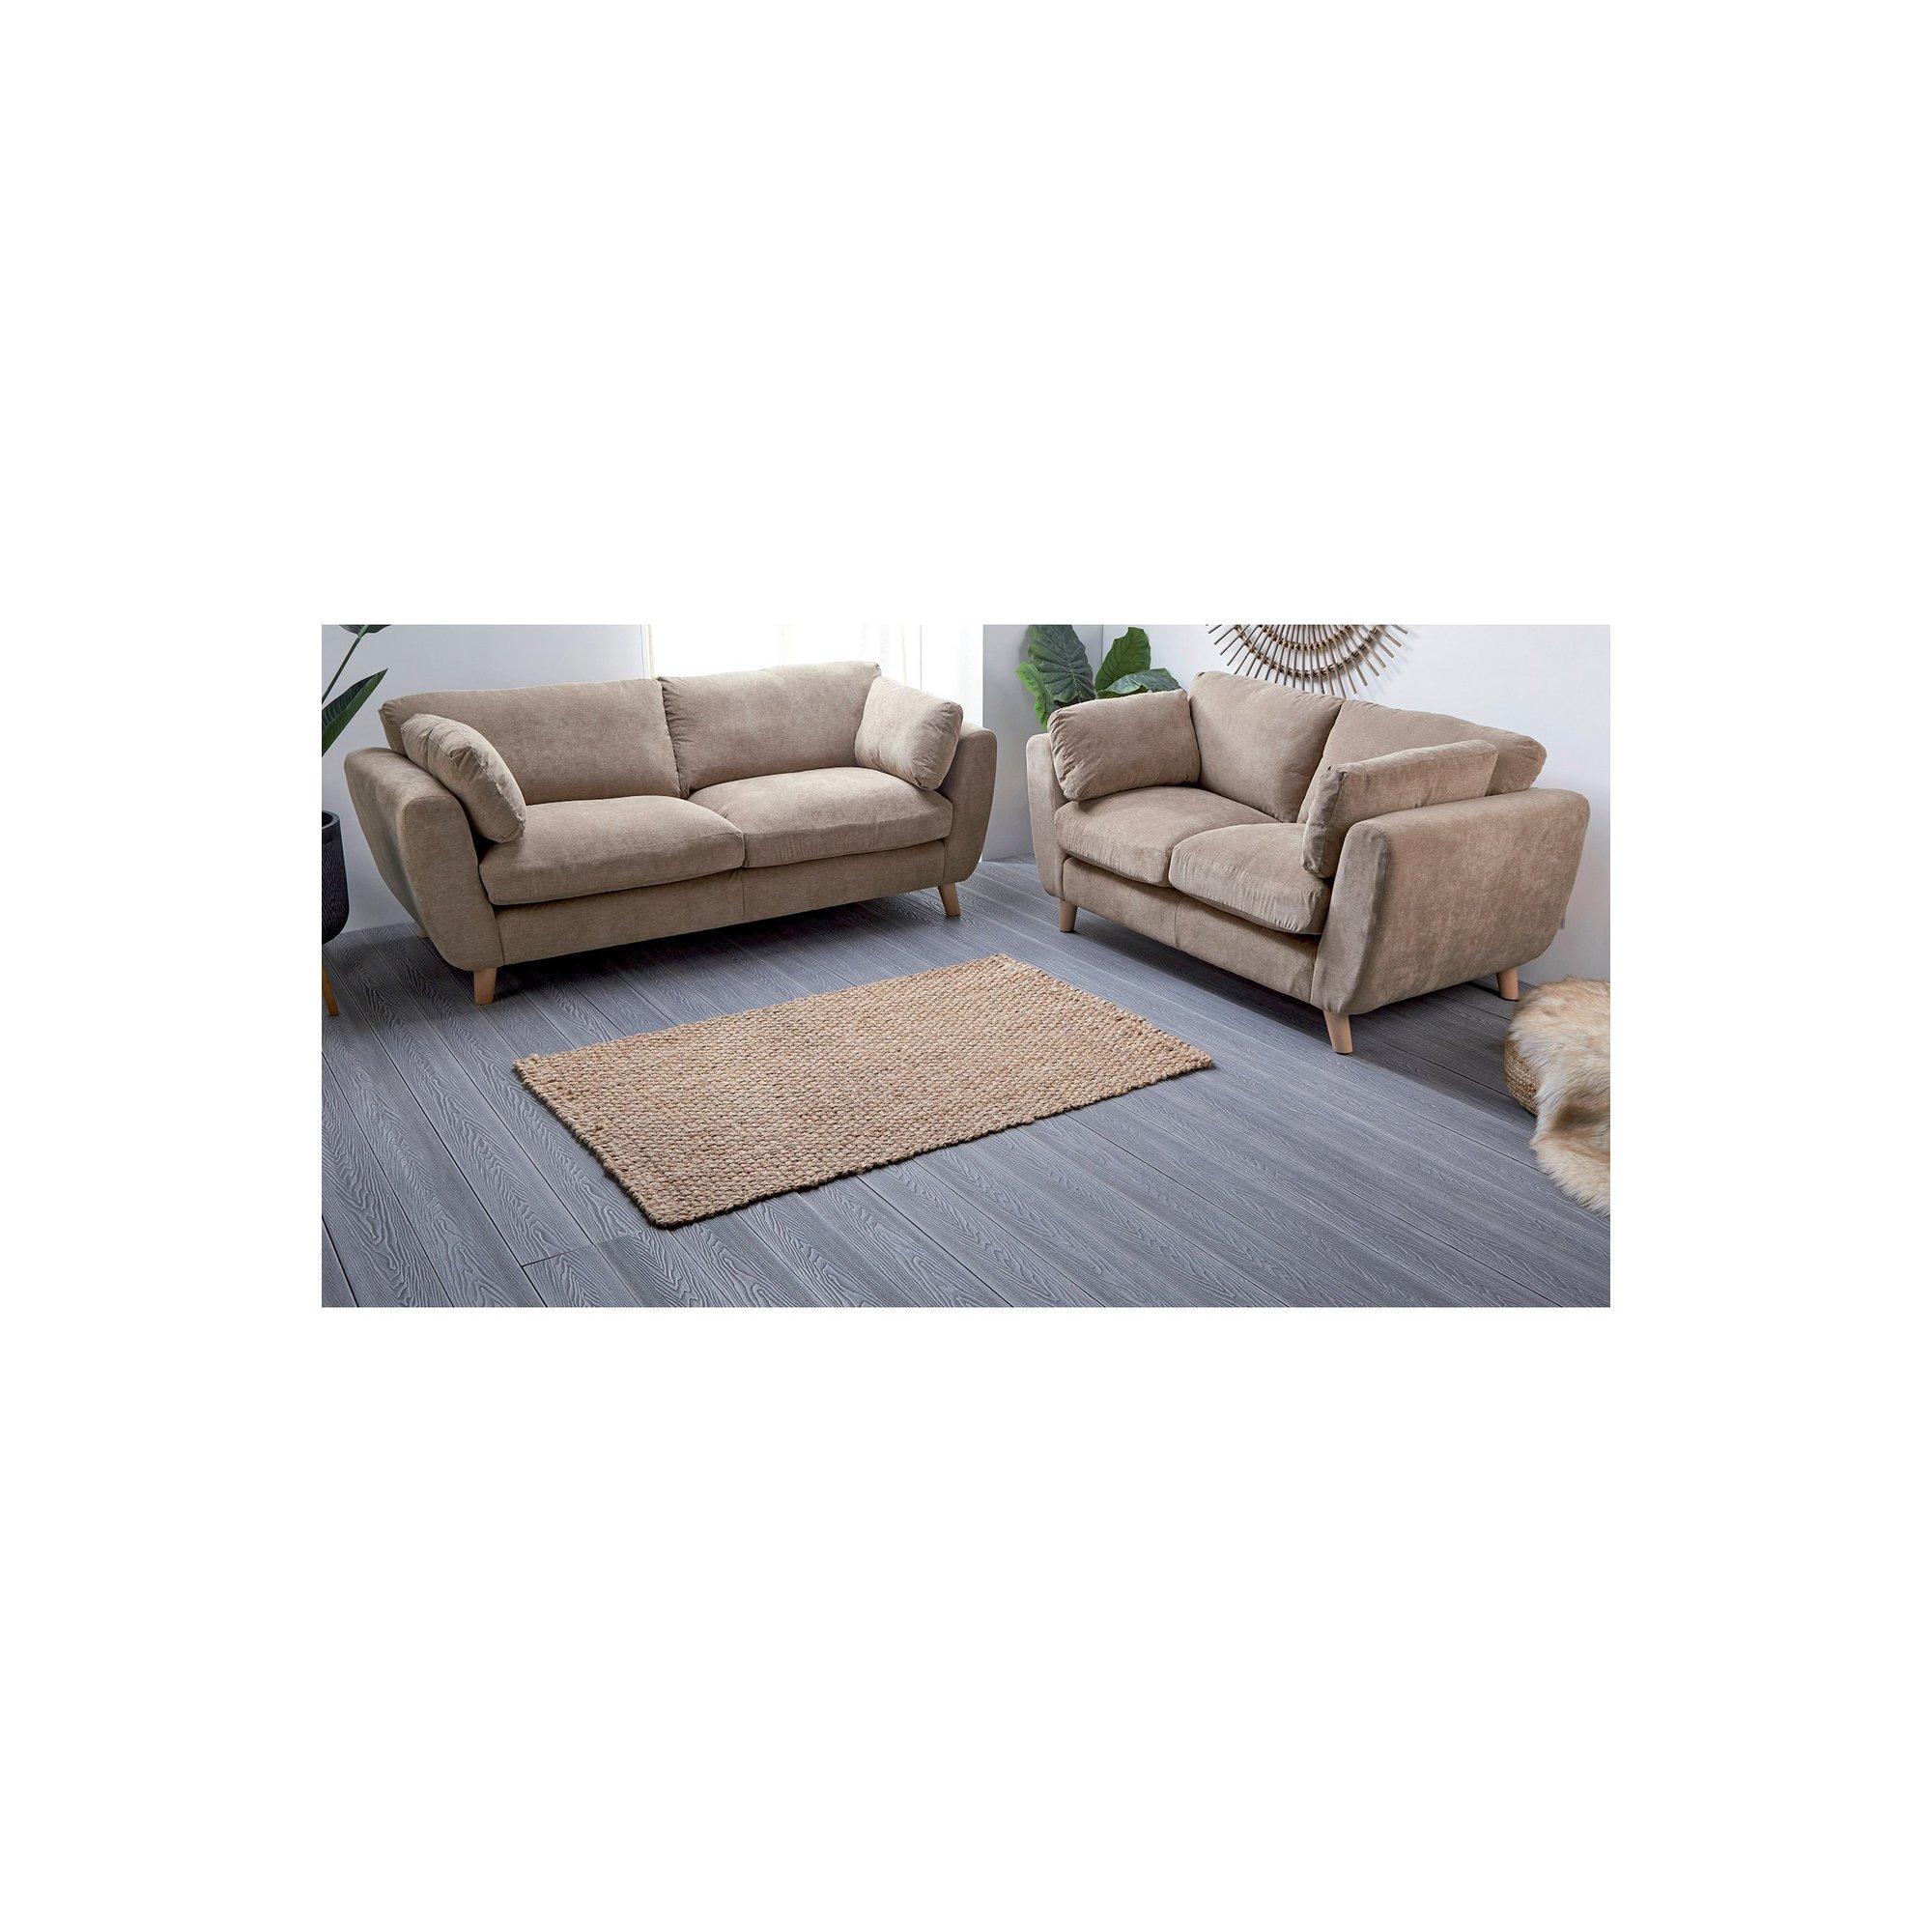 Image of Avon 3 + 2 Seater Sofa Offer